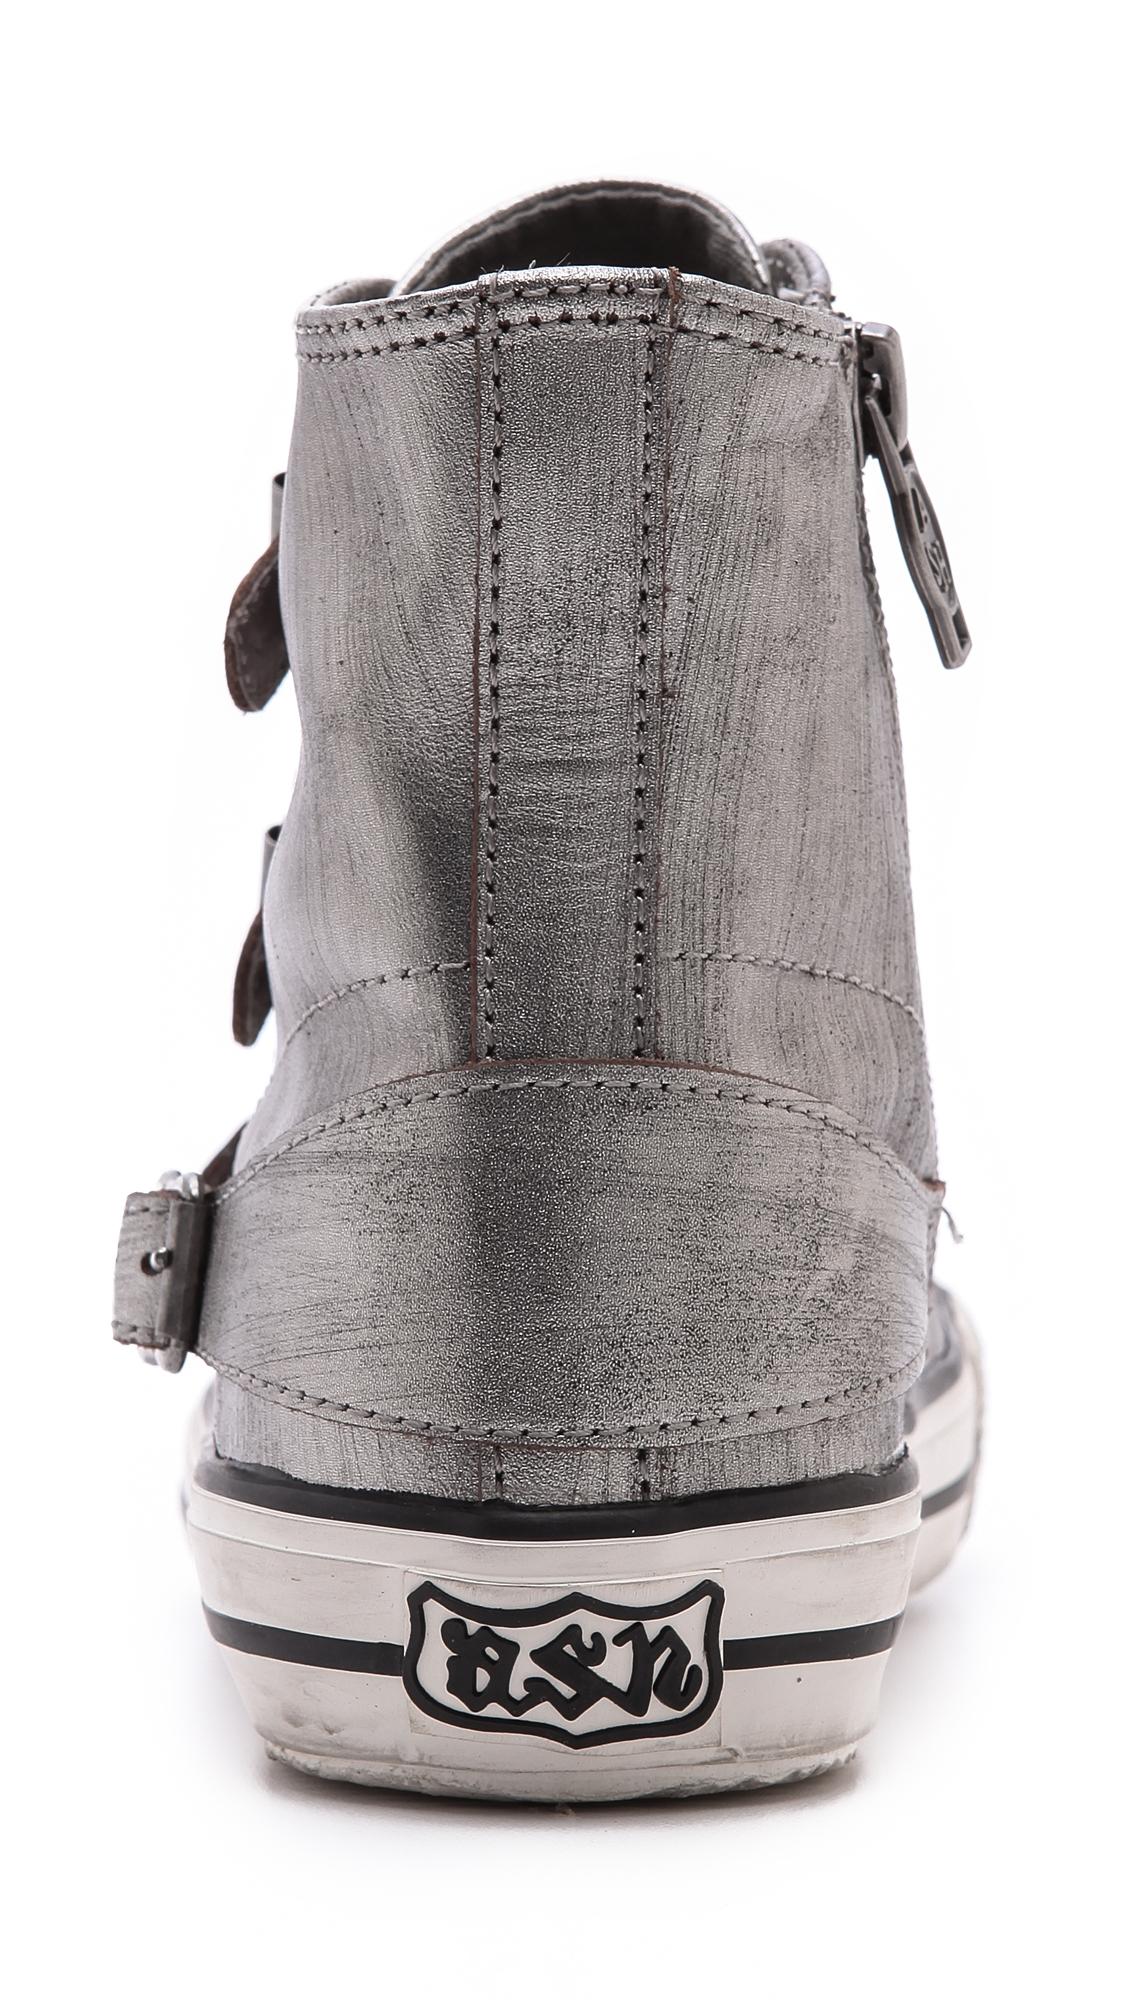 Ash Virgin High Top Sneakers in Grey